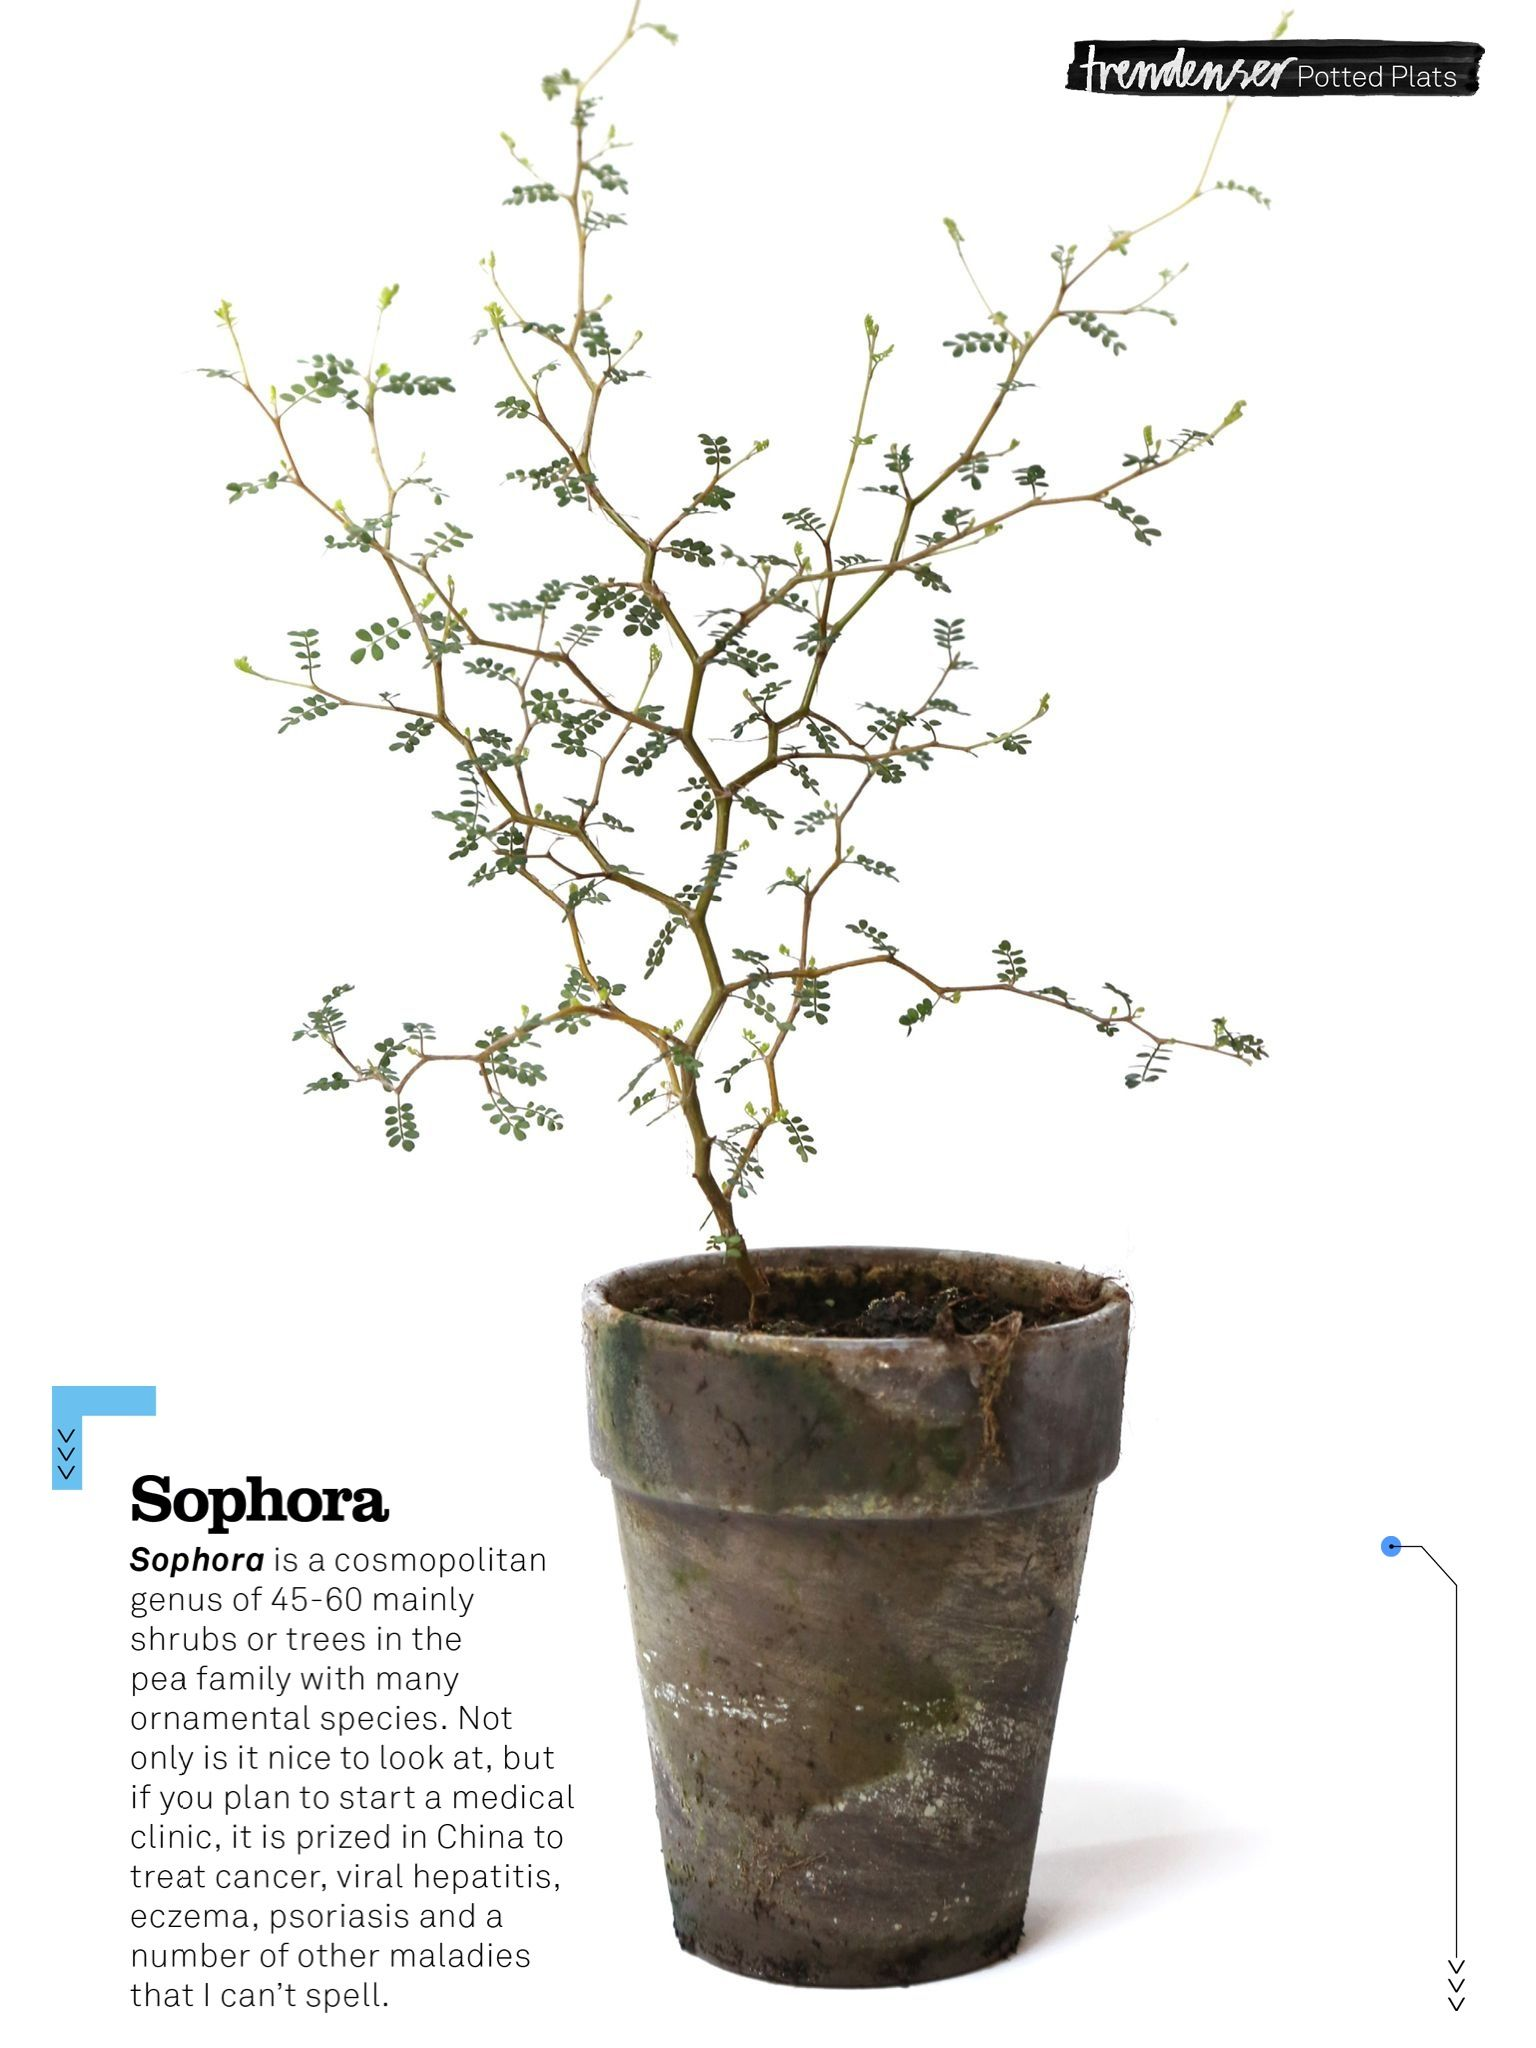 Sophora Plant (Trendenserse)